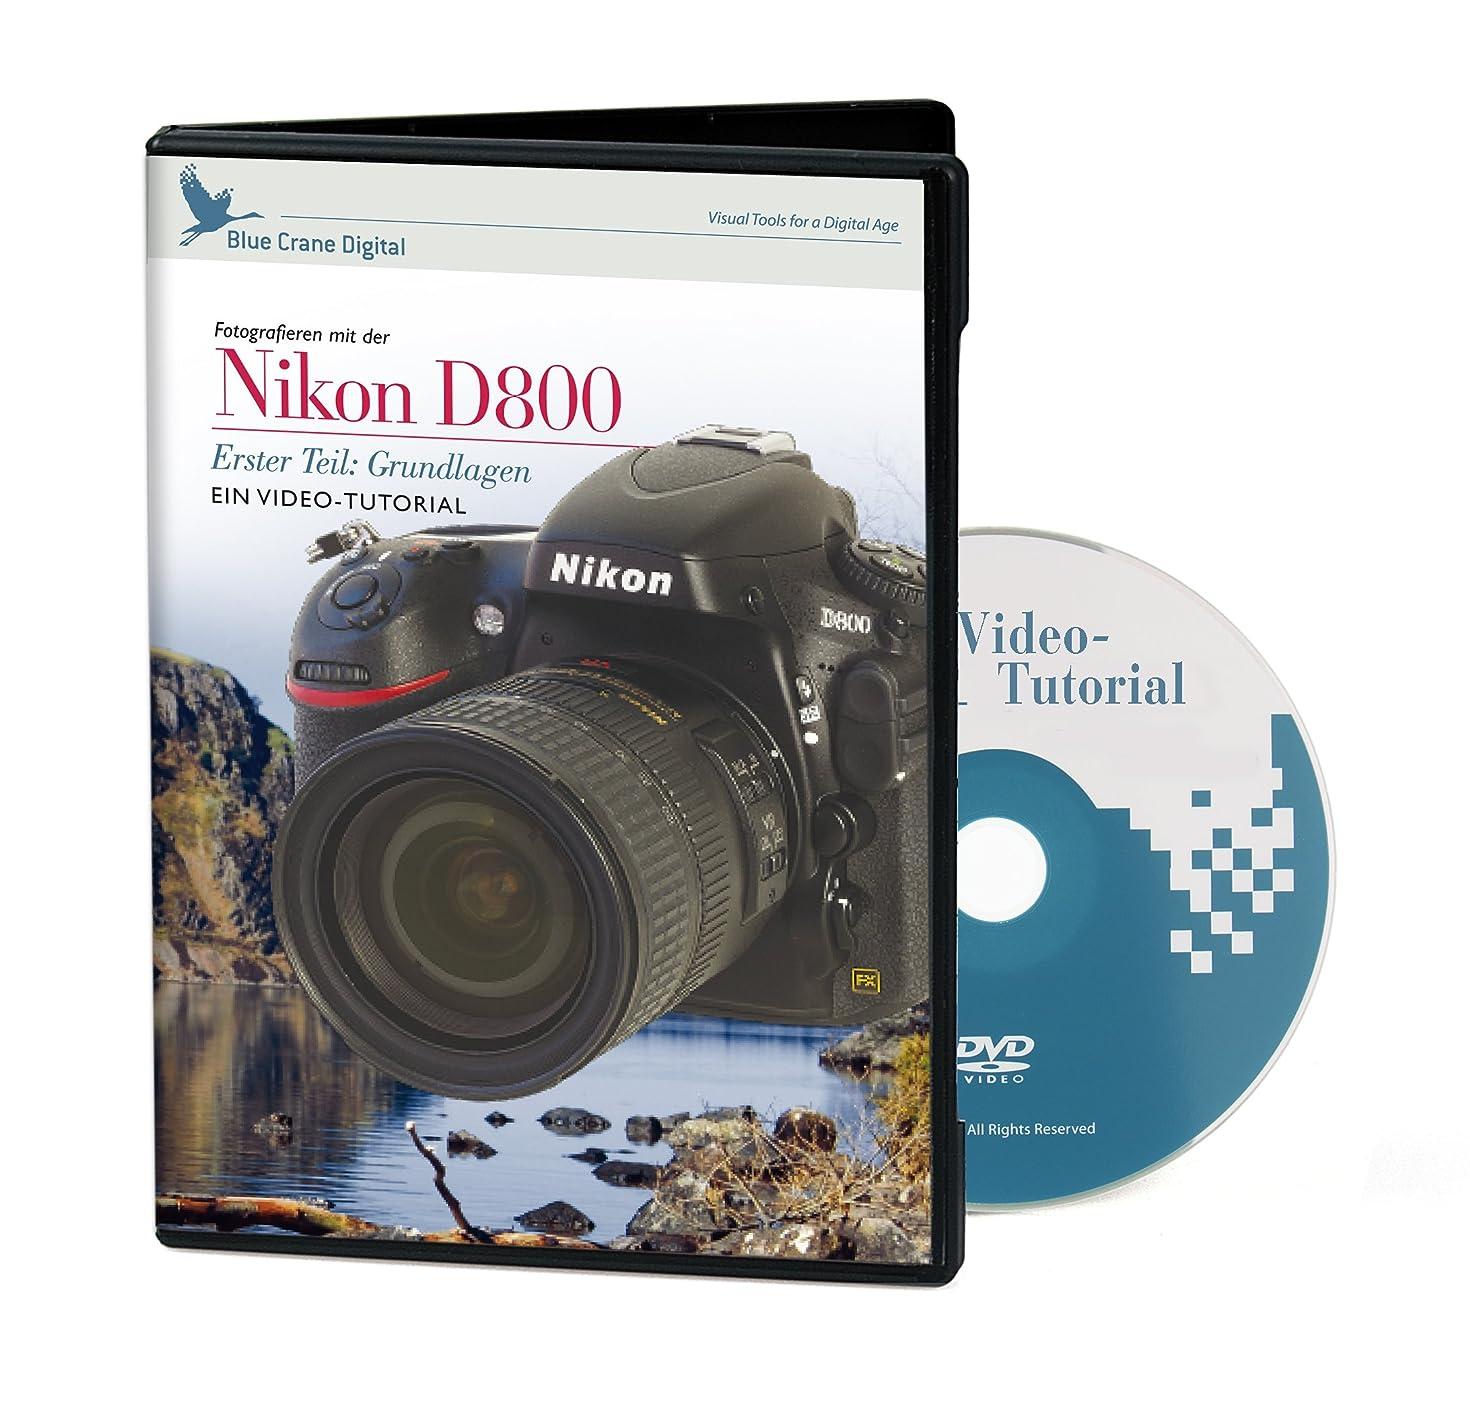 Kaiser Video Tutorial (DVD, German)